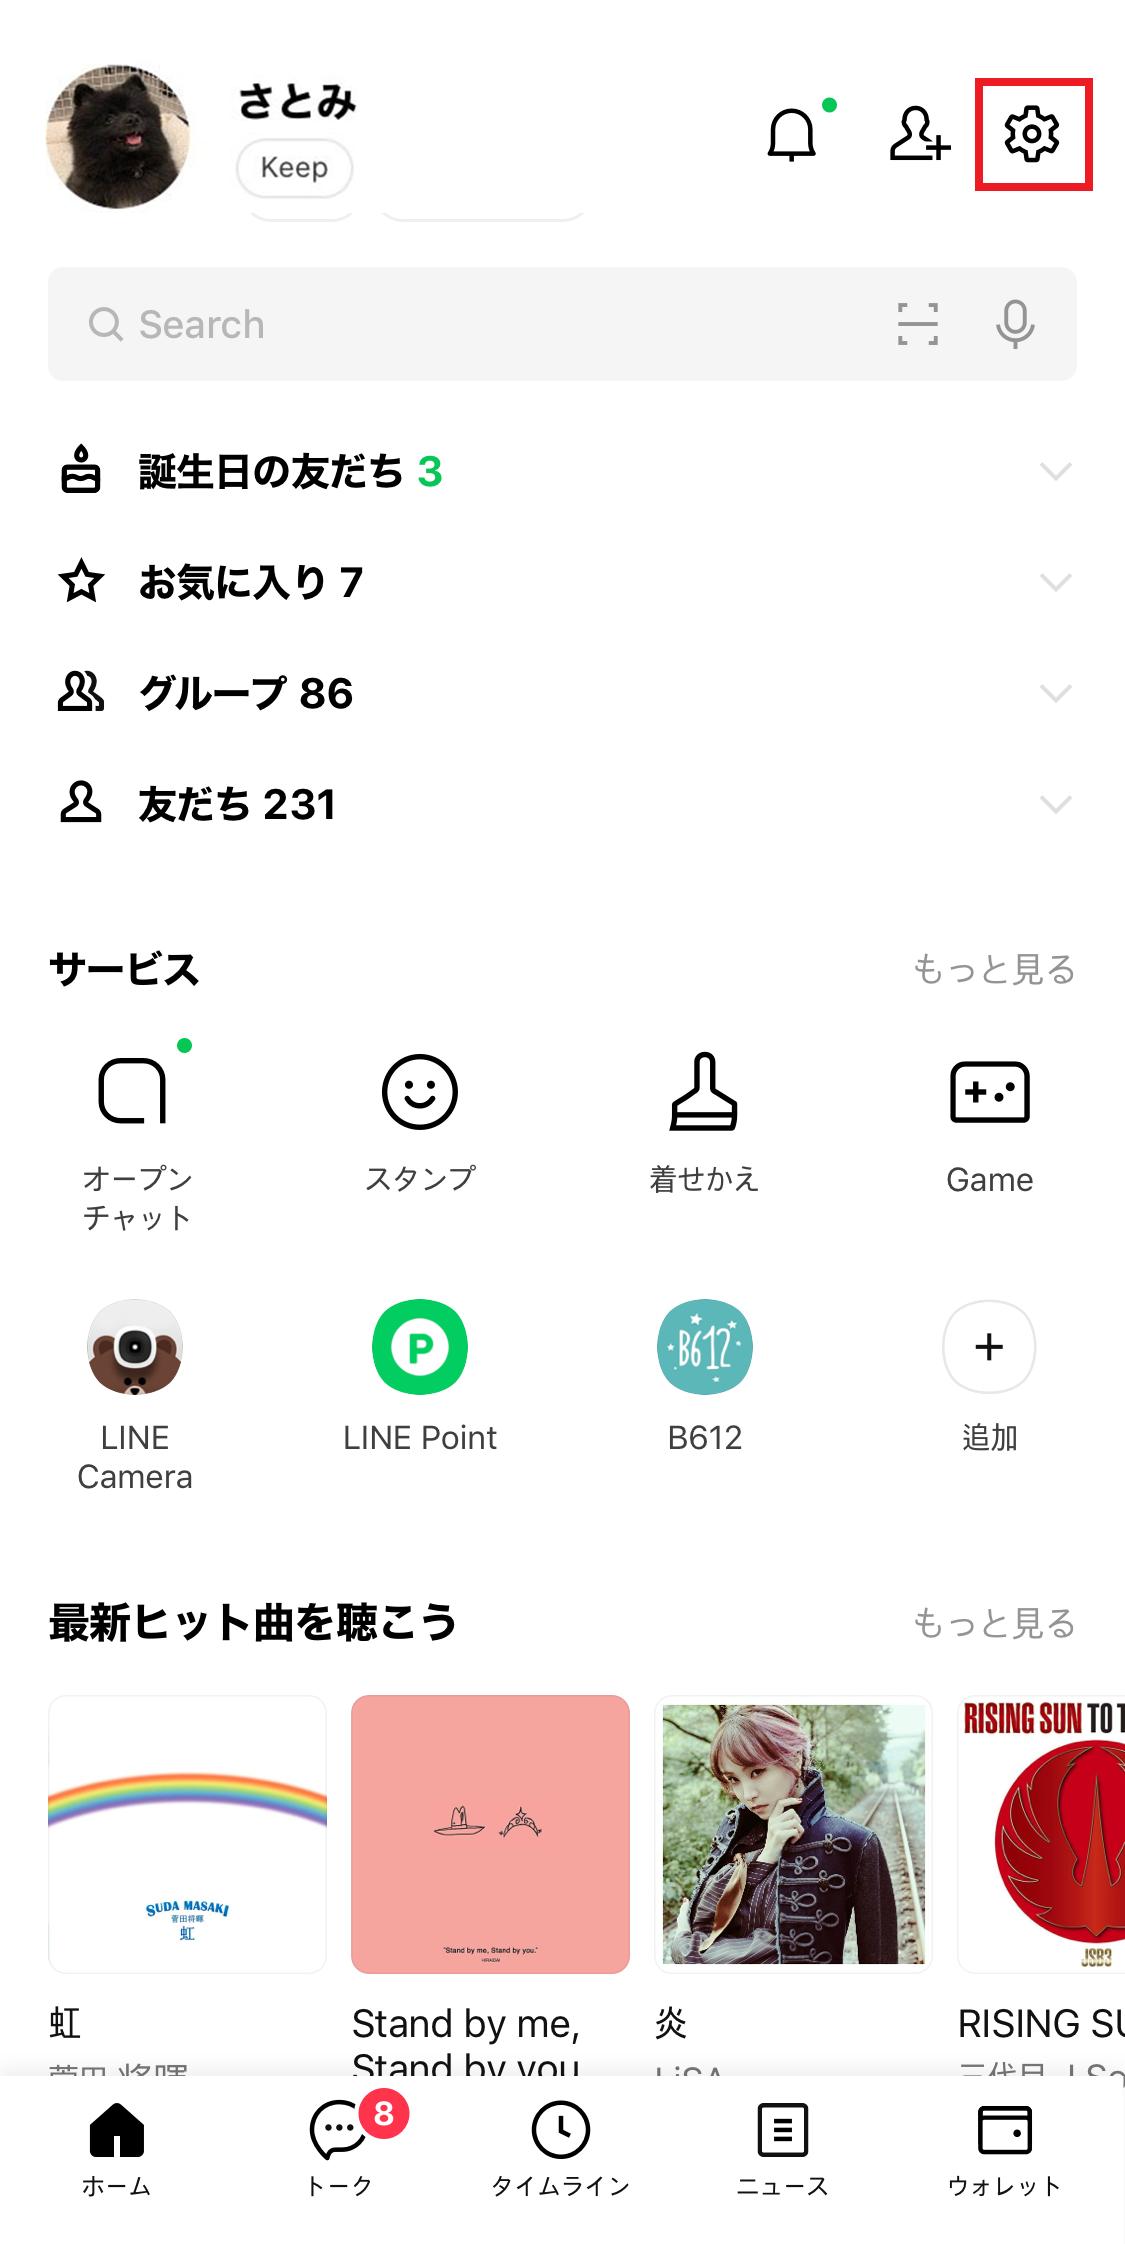 bgm-profile_01.png